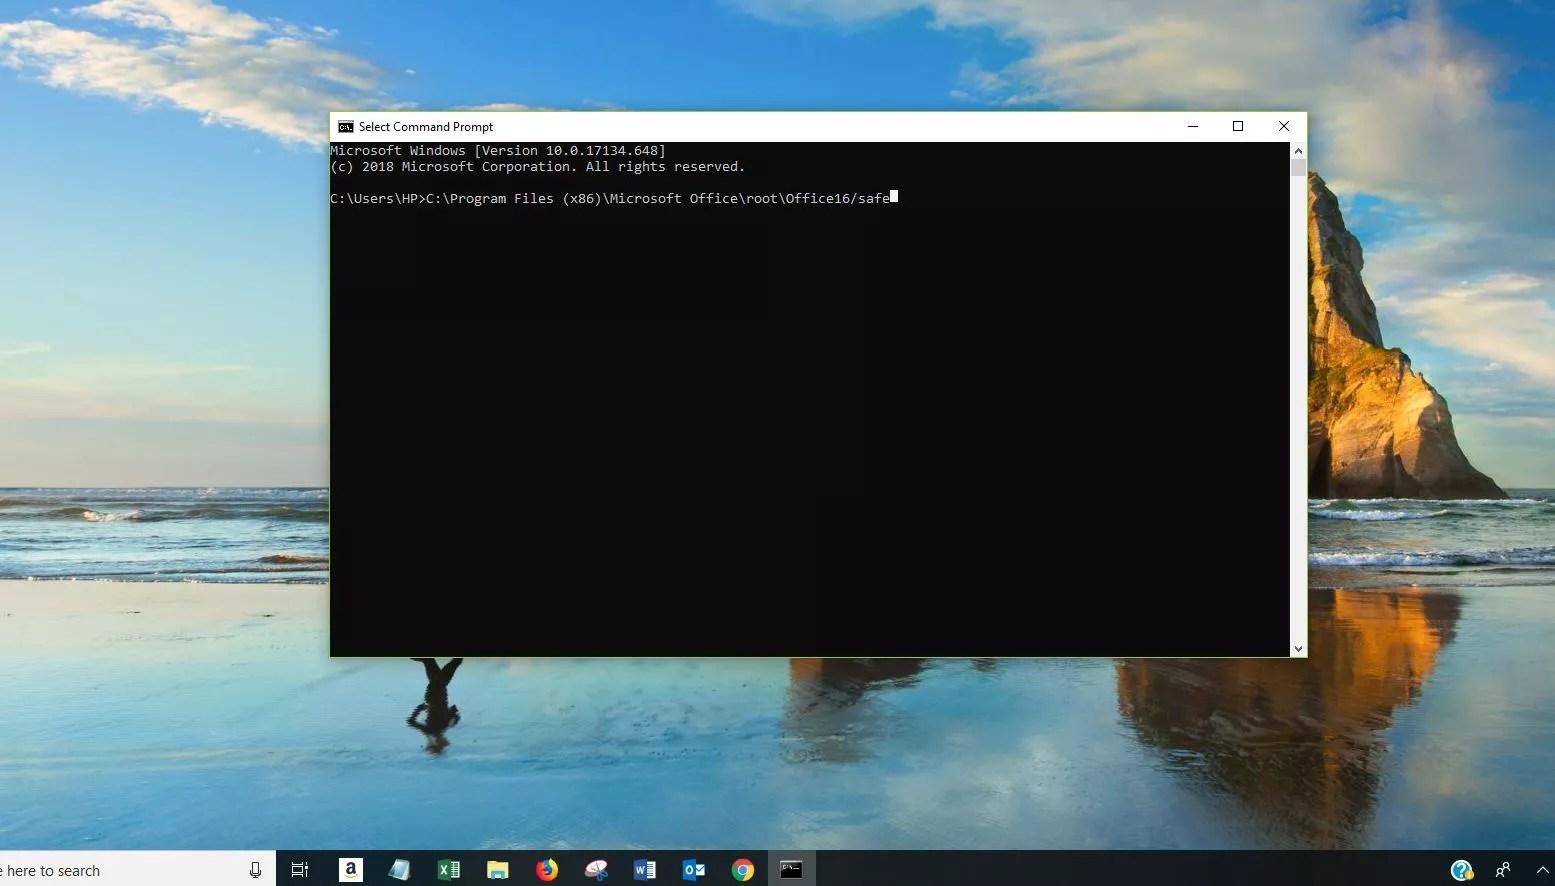 Screenshot of Command Prompt window